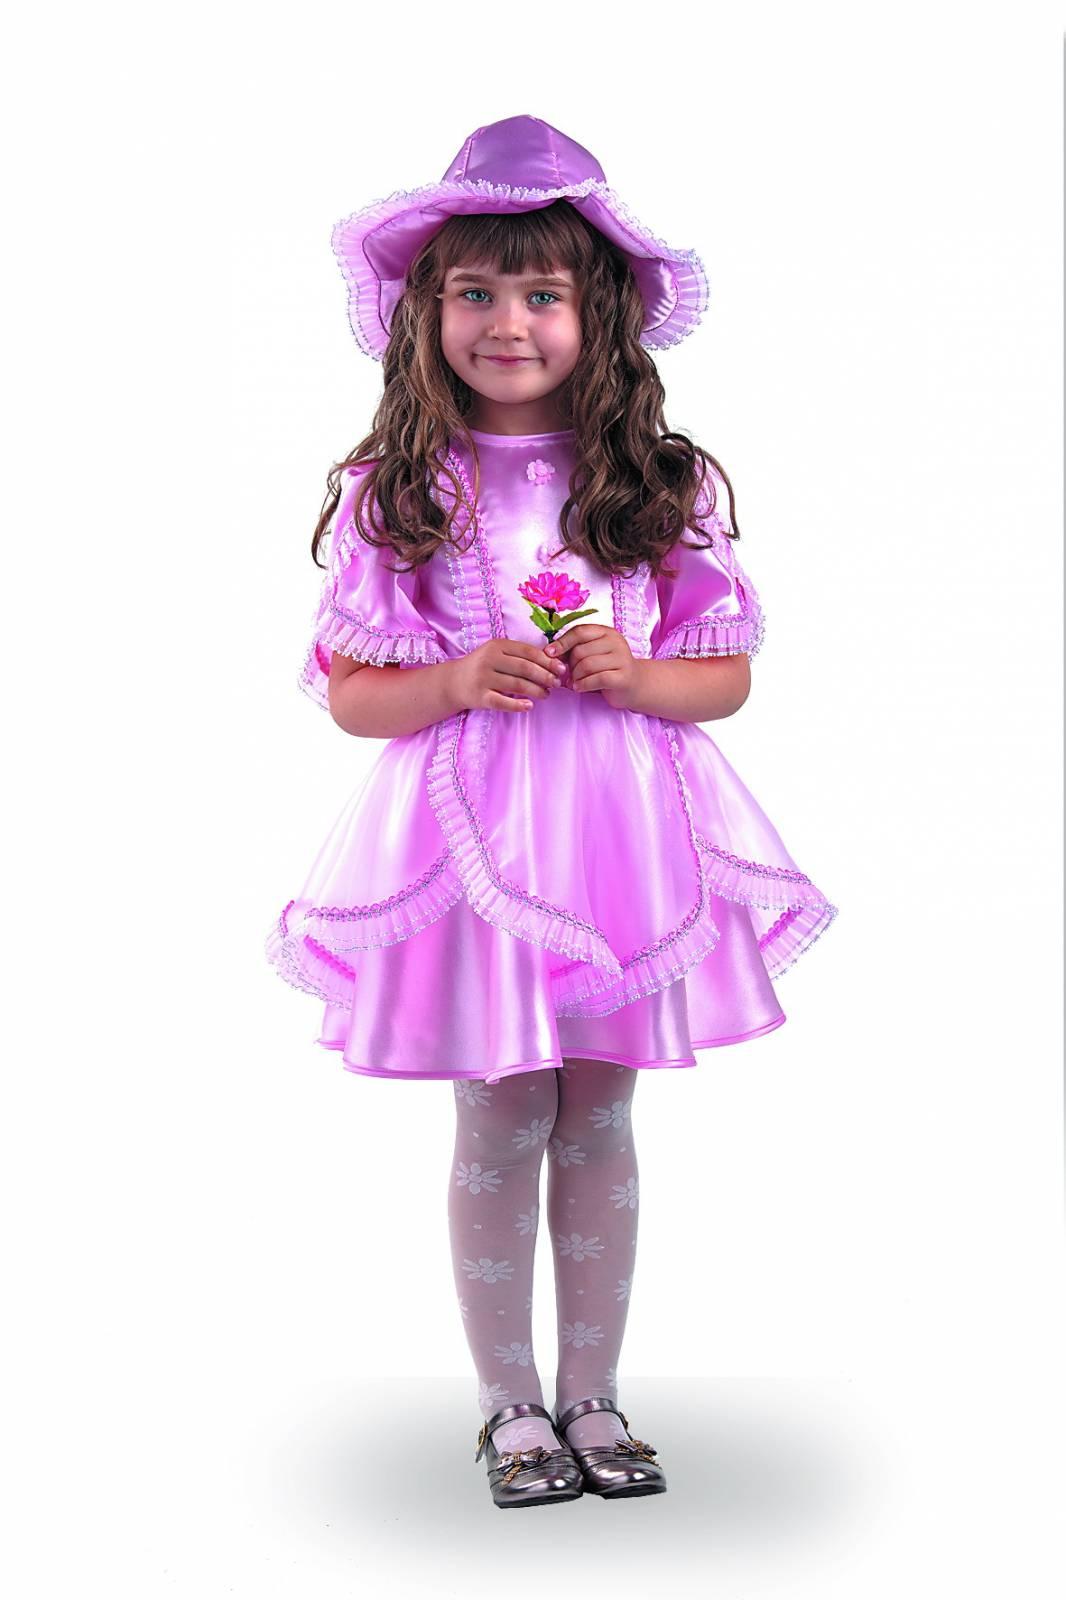 Новогодний костюм дюймовочки для девочки своими руками